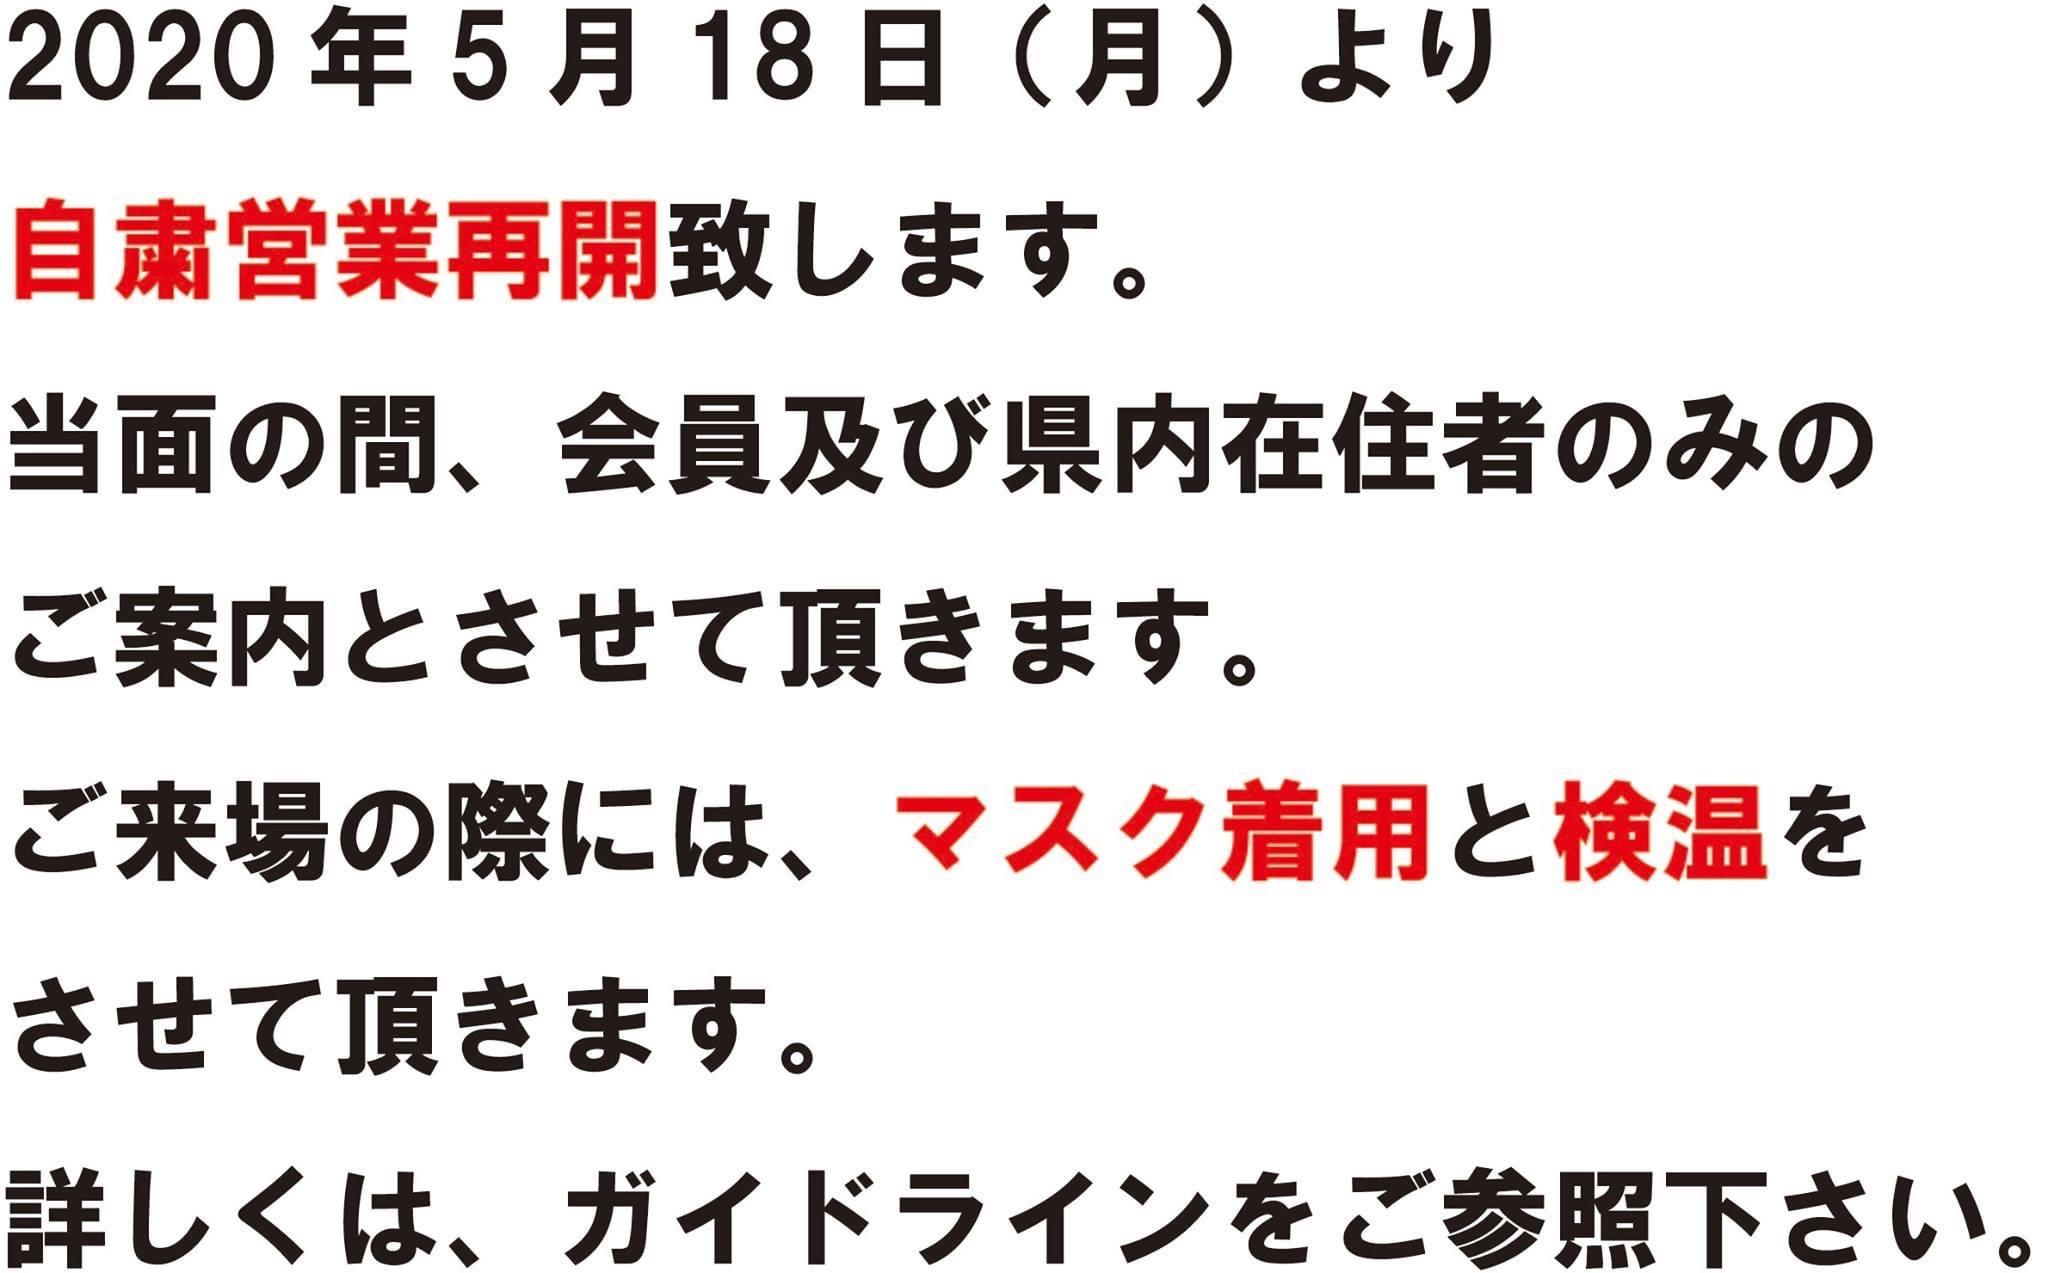 DF683D1E-E714-4E39-9A84-8E4D07AB8624.jpeg